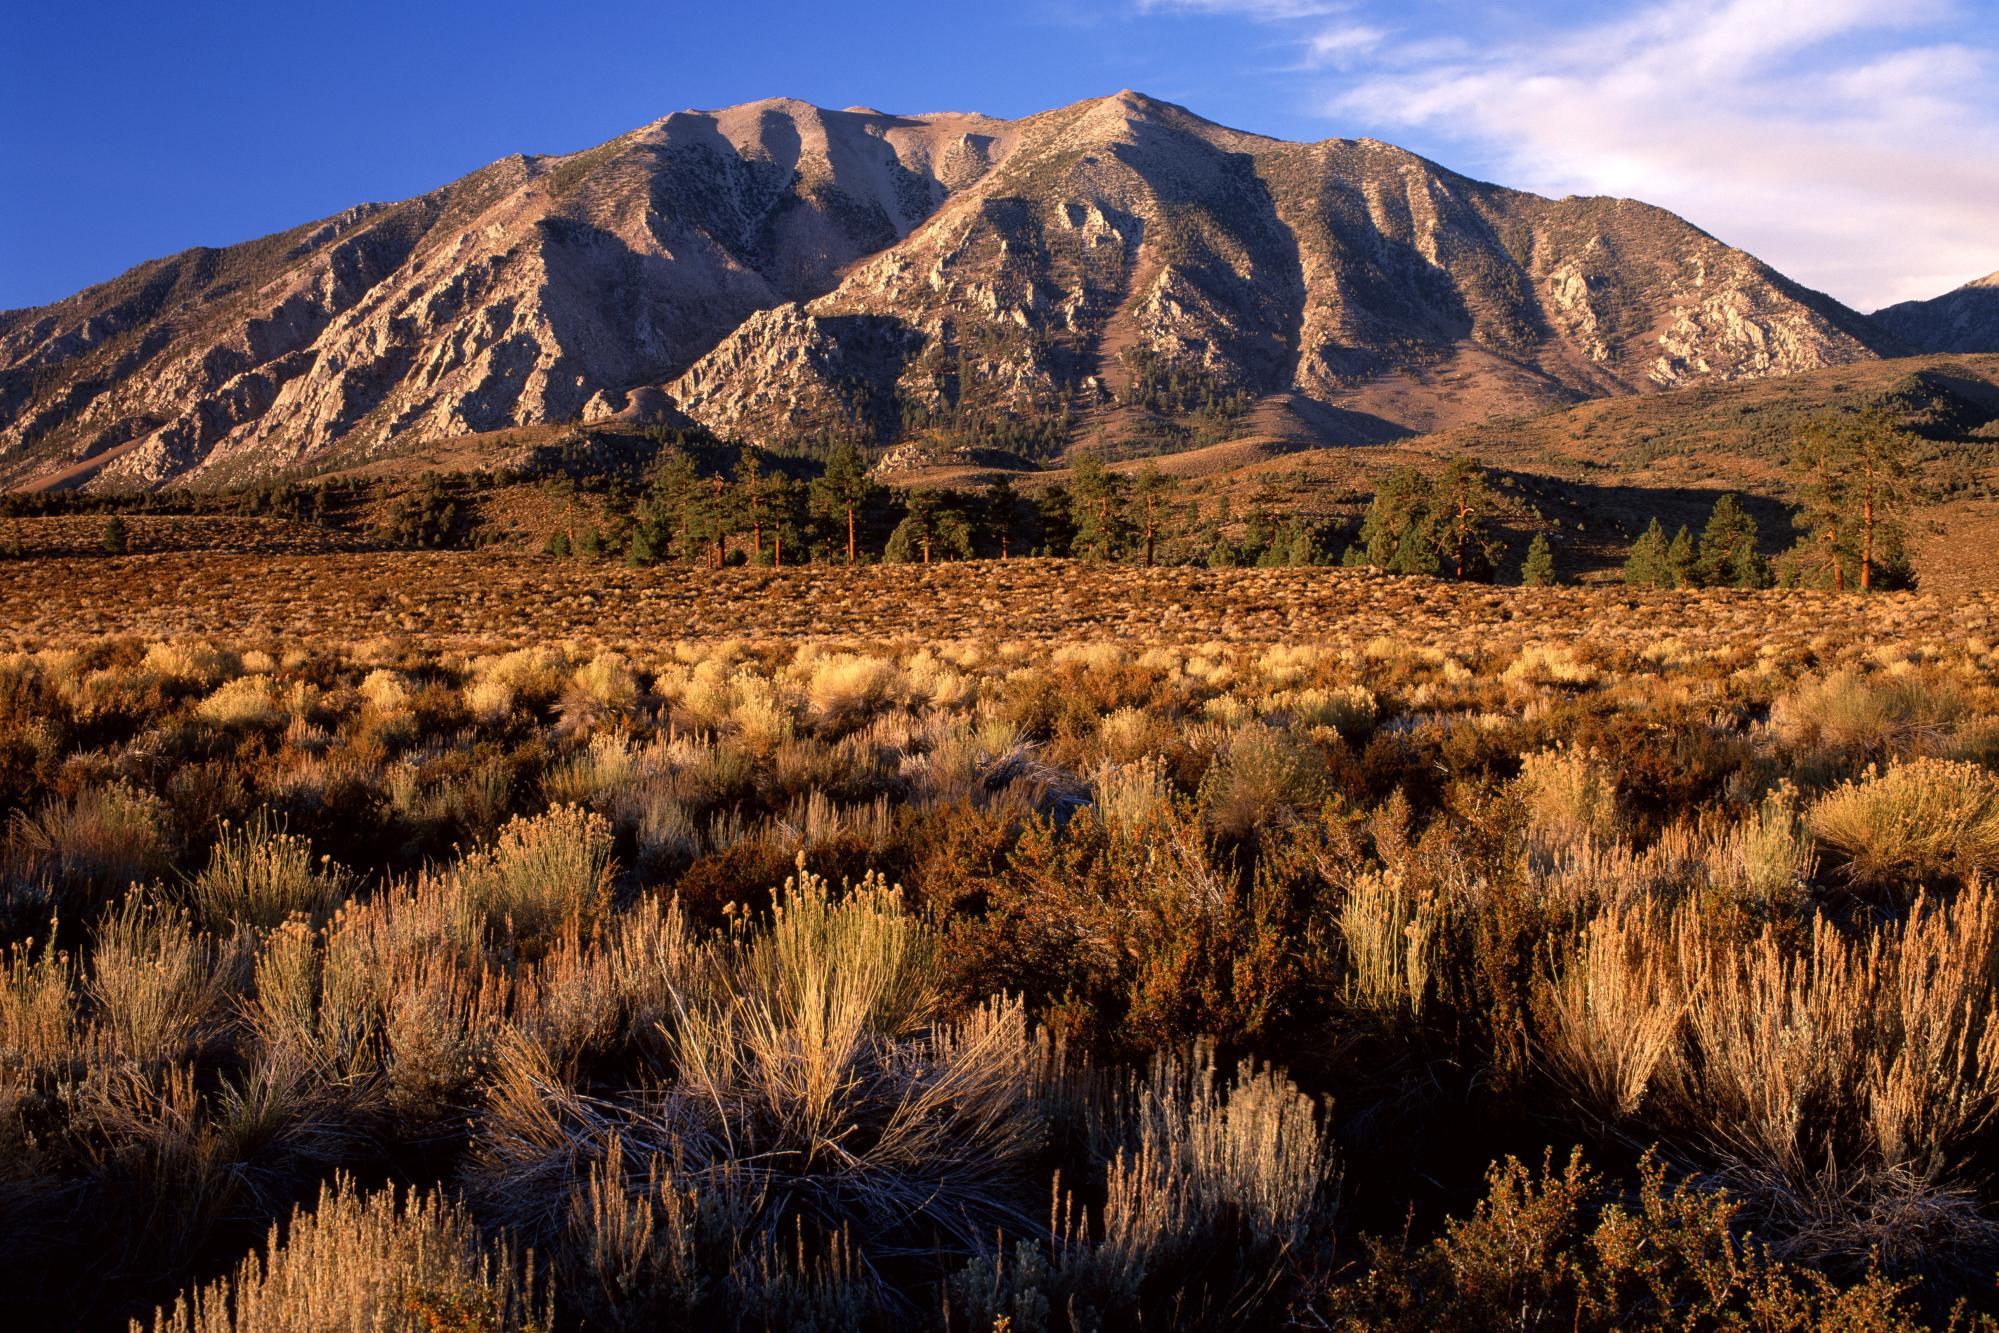 California mountains wallpaper | 1999x1333 | 7693 | WallpaperUP